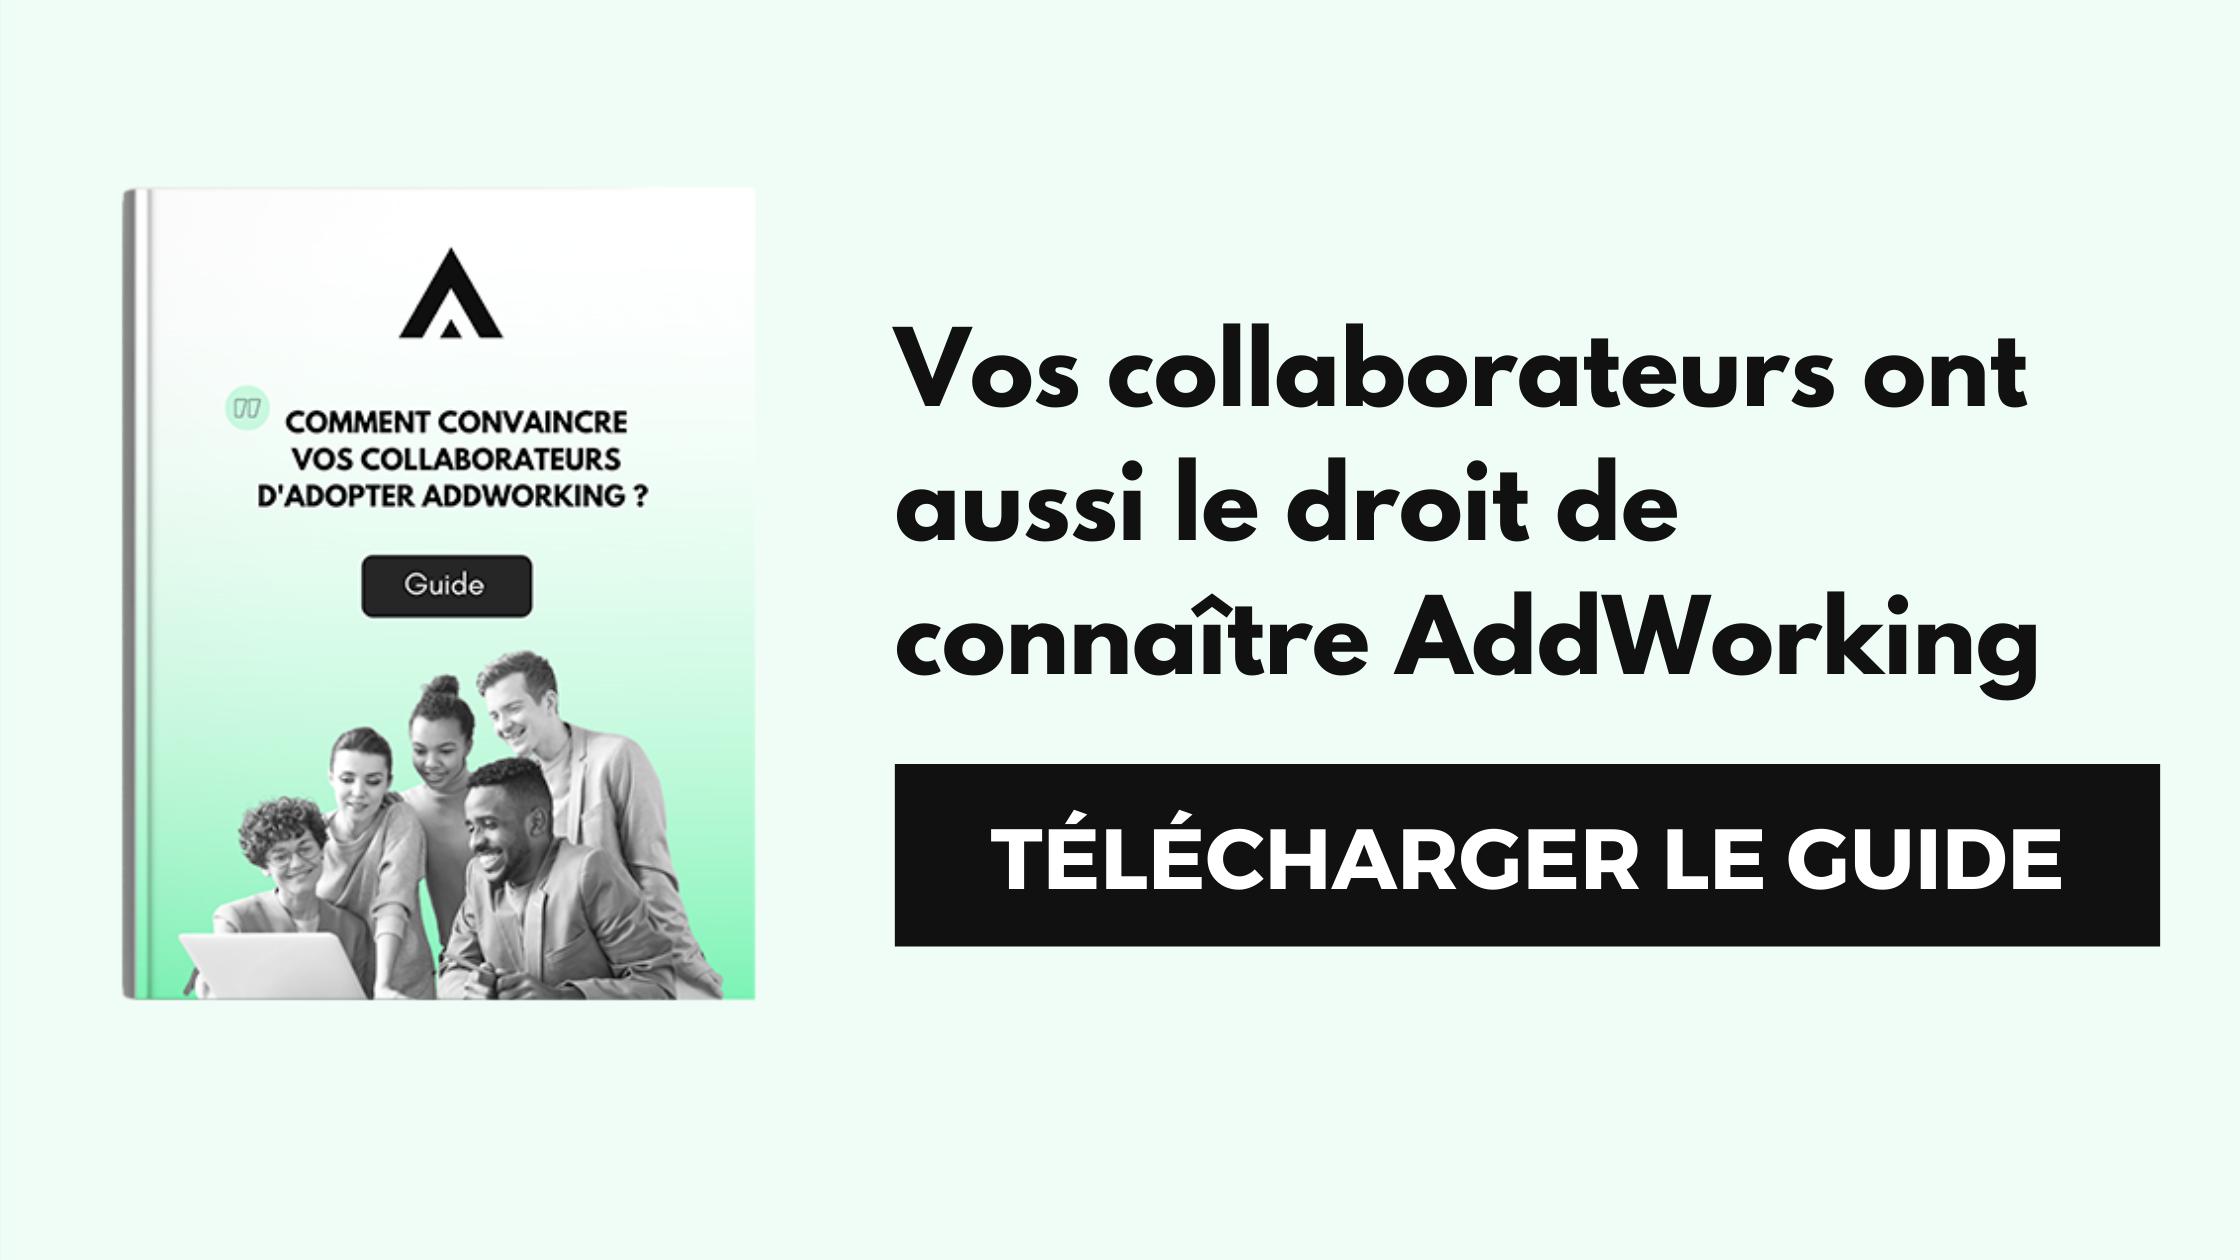 Comment convaincre vos collaborateurs d'adopter AddWorking ?